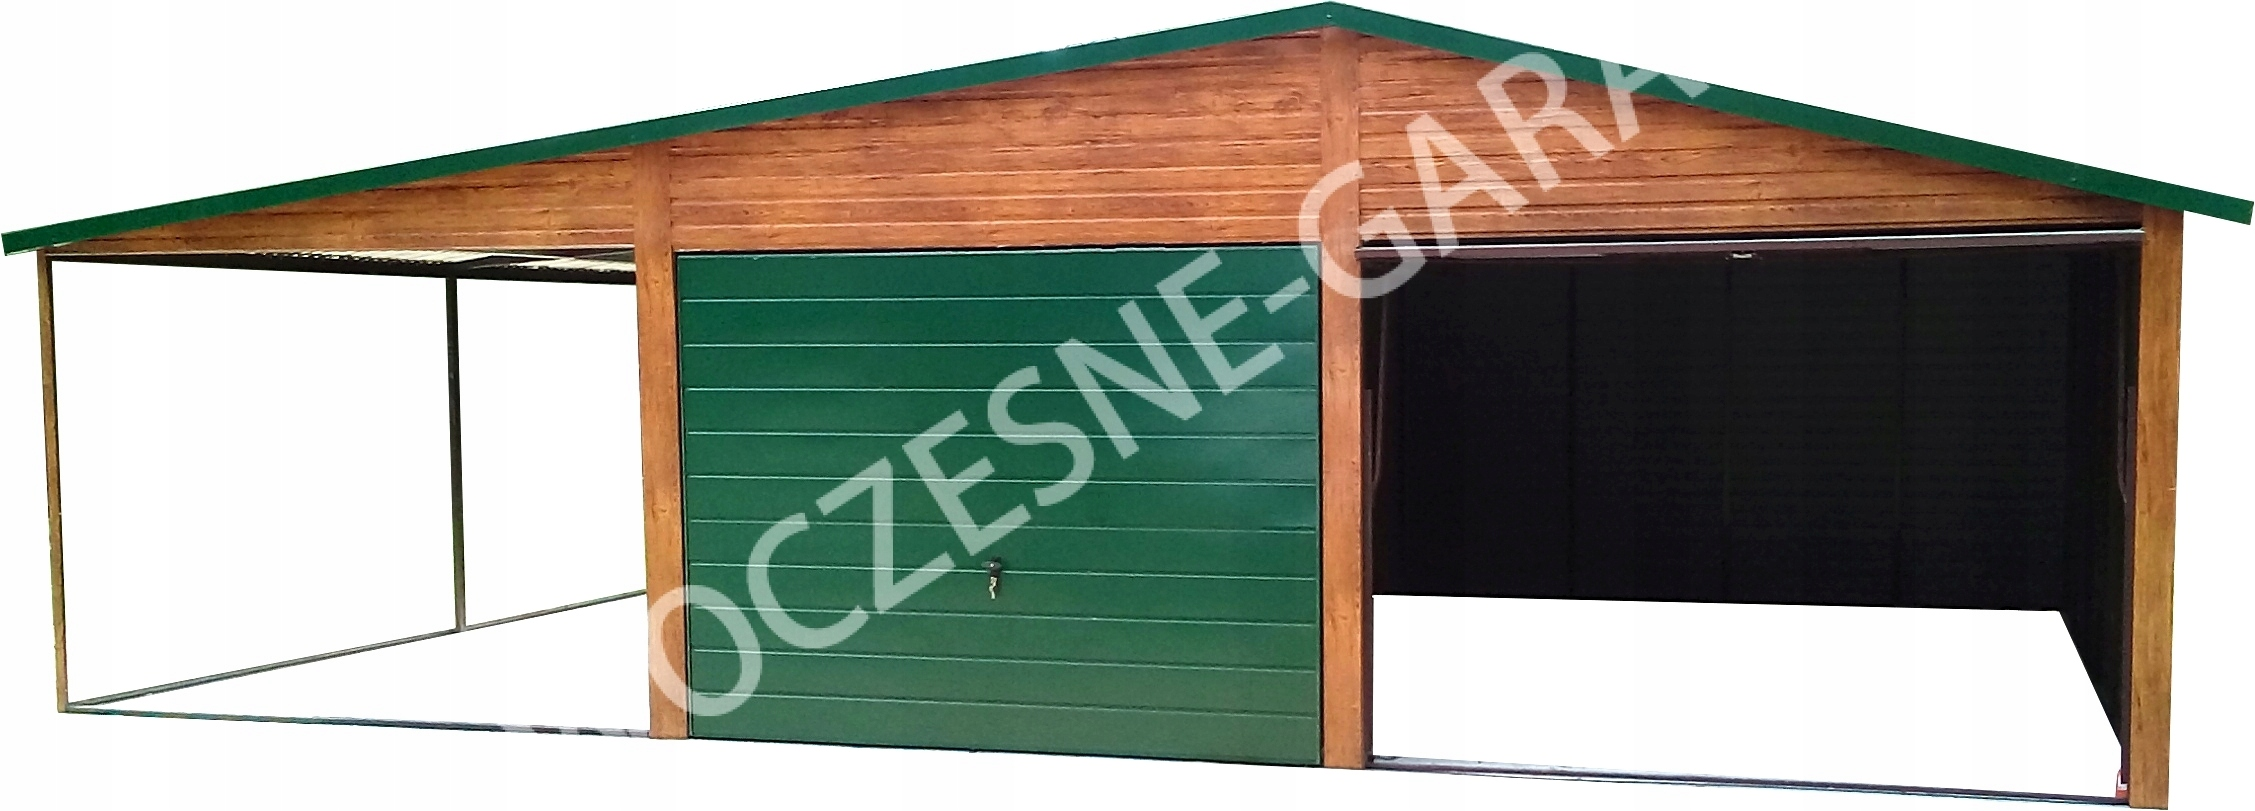 Garaże Blaszane Garaż Blaszany Jakość Premium 7485112688